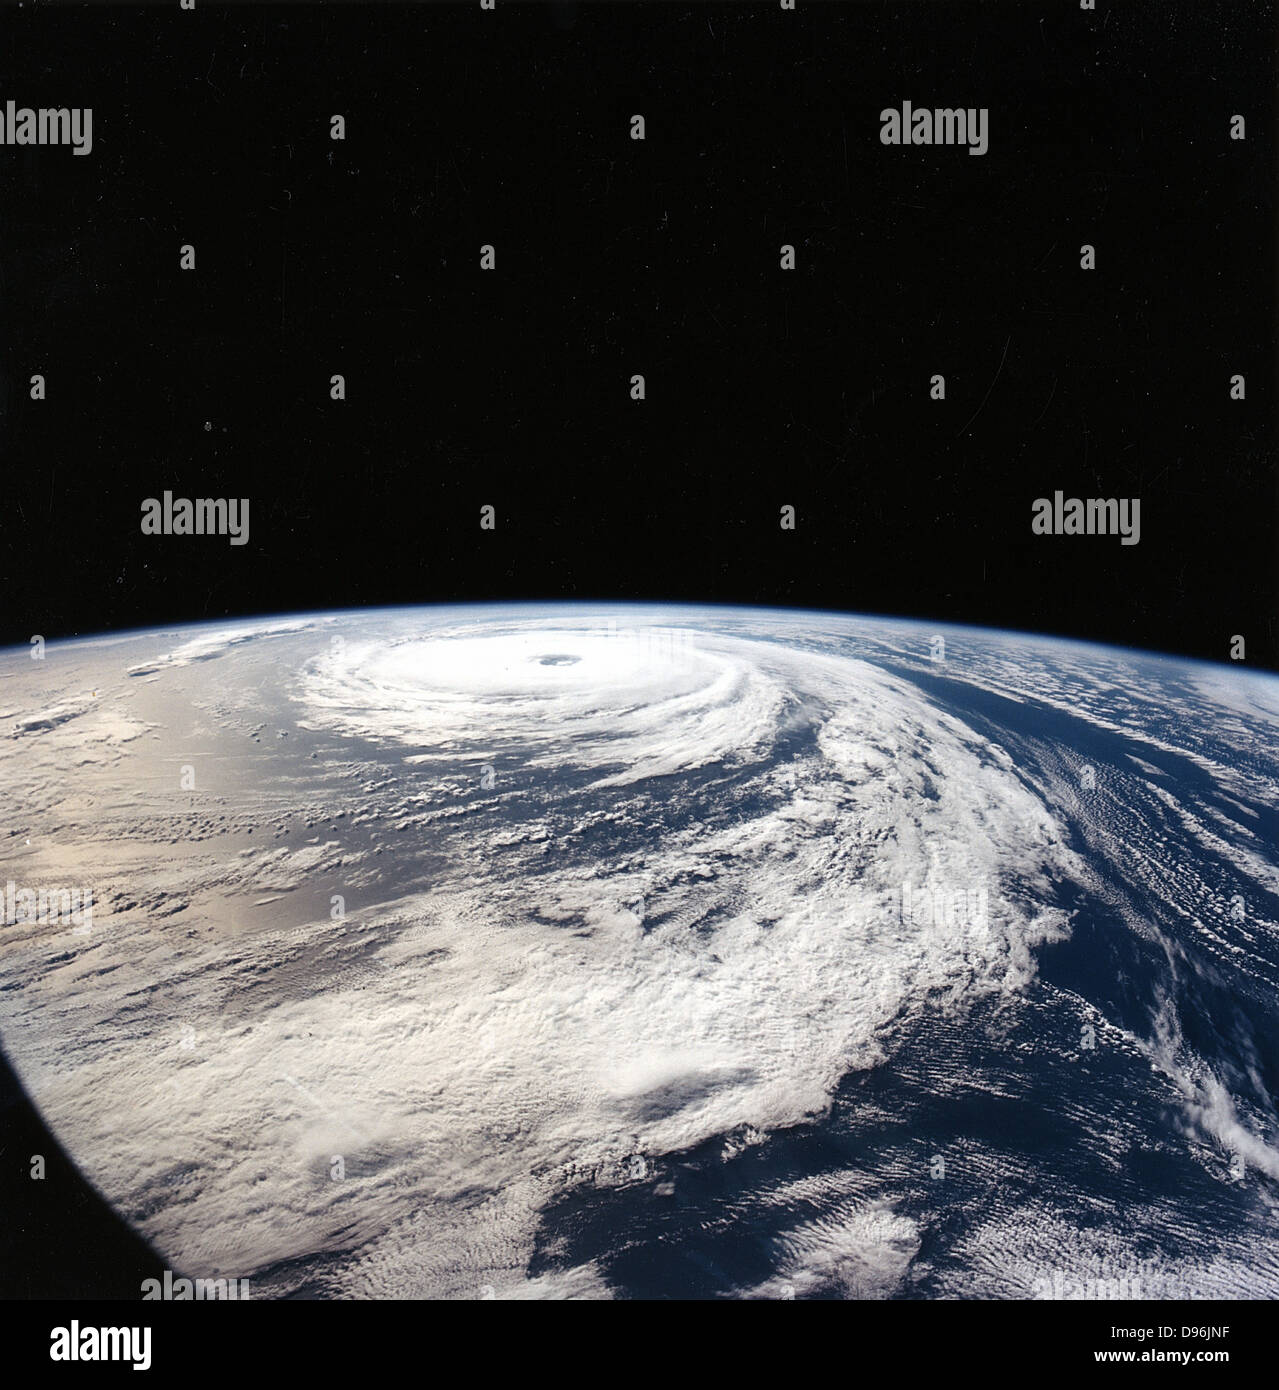 "Hurrikan ""Florenz"" 165n vom Space Shuttle Atlantis entnommen. Meilen über der Erde. NASA Stockbild"